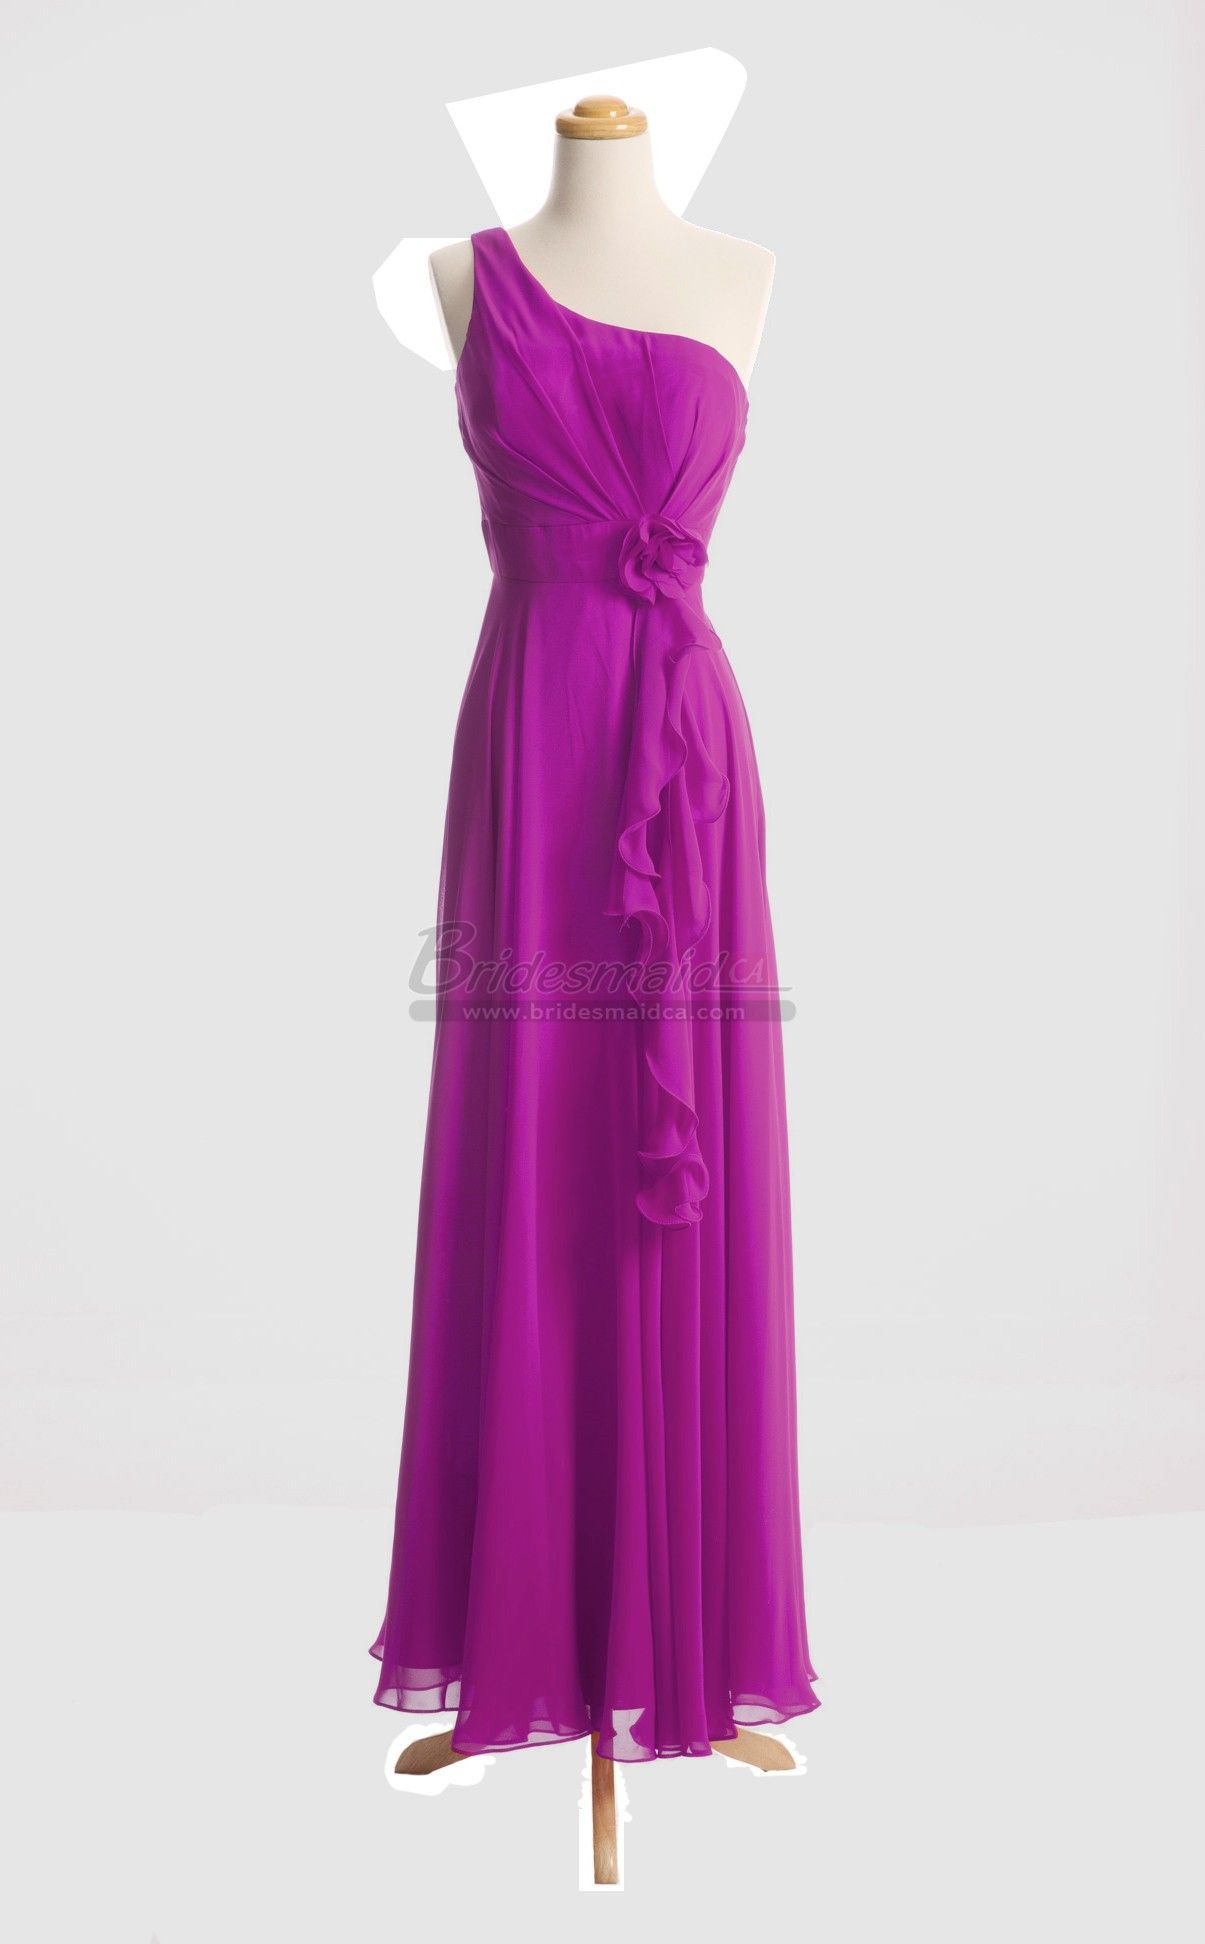 One Shoulder Chiffon Long Fuchsia Bridesmaid Dress in Purple Dresses ...